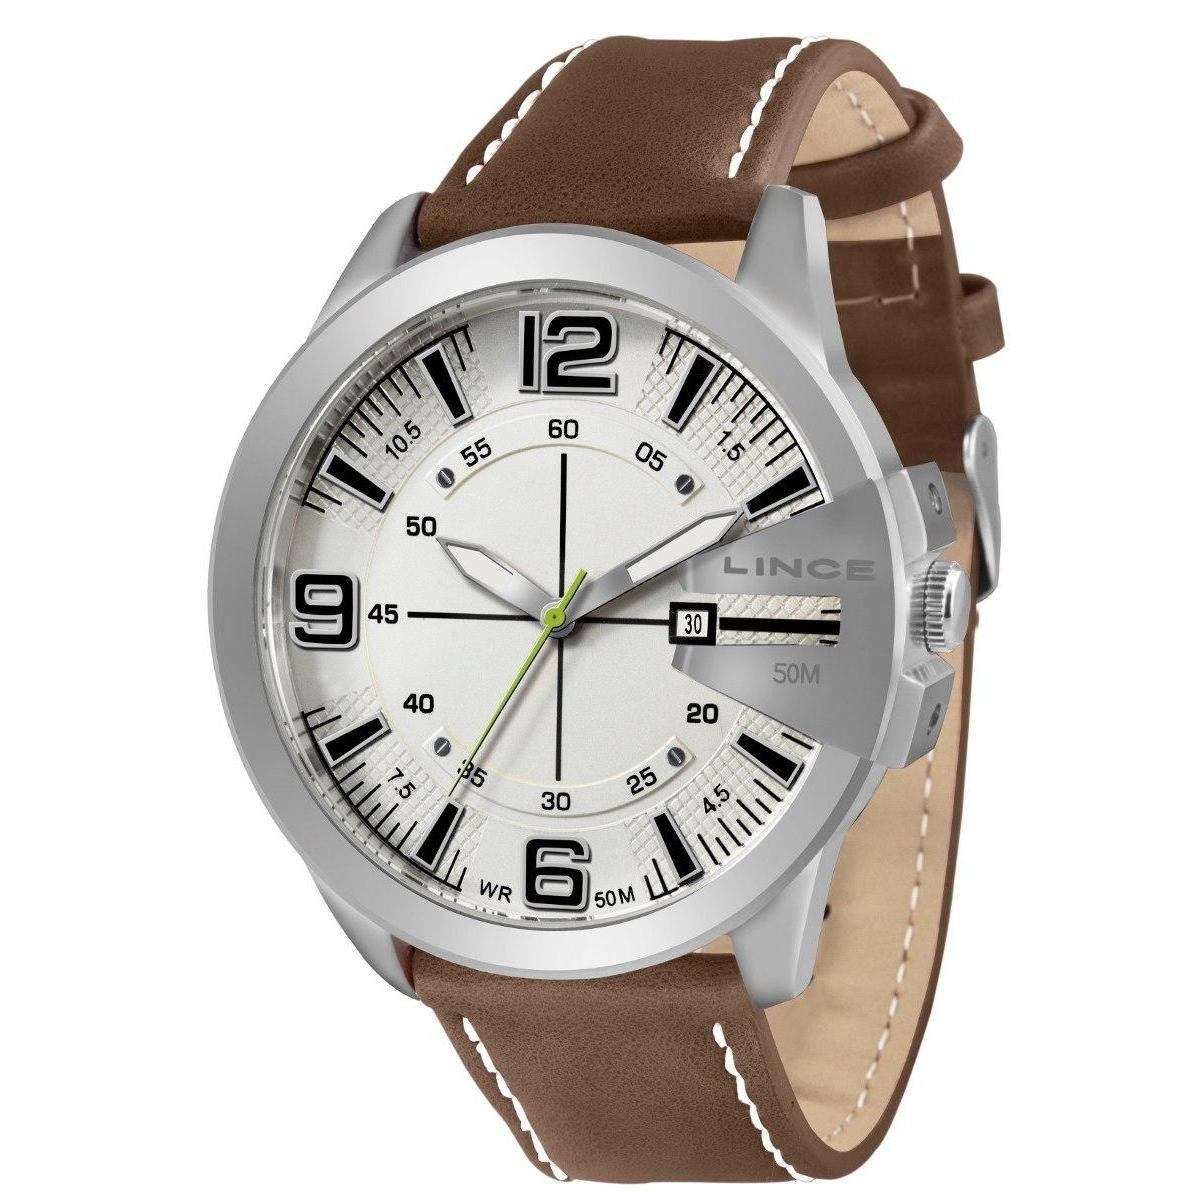 32a9b0523b9 Relógio Masculino Lince Analógico Mrc4333s B2nb - Compre Agora ...